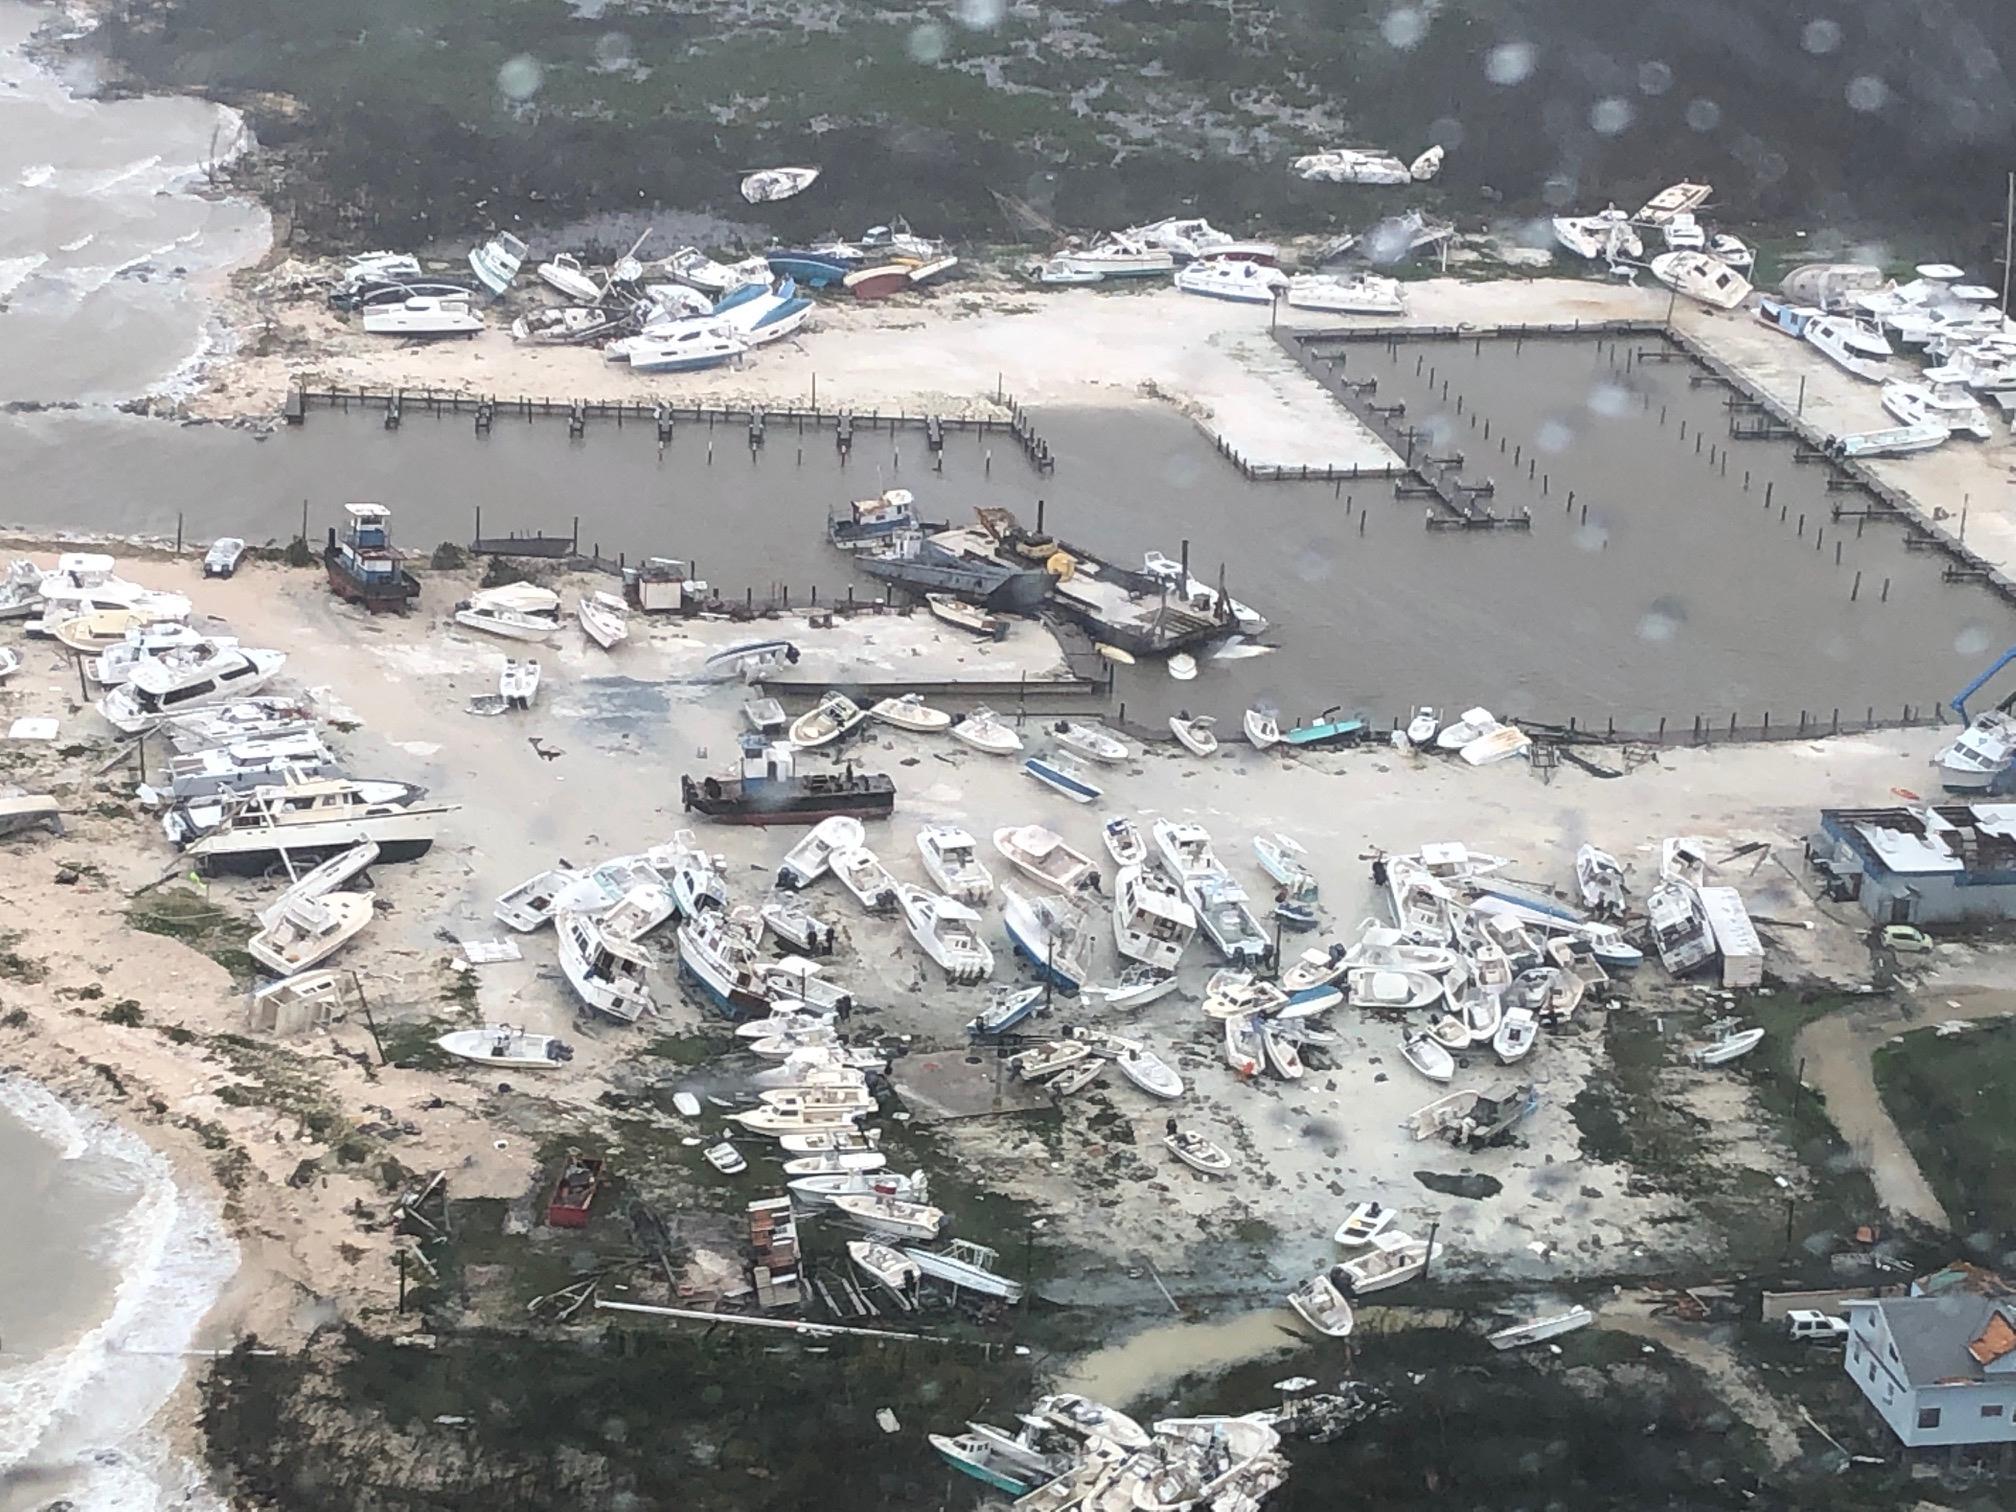 Hurricane_Dorian_destruction_-Bahamas.jpg